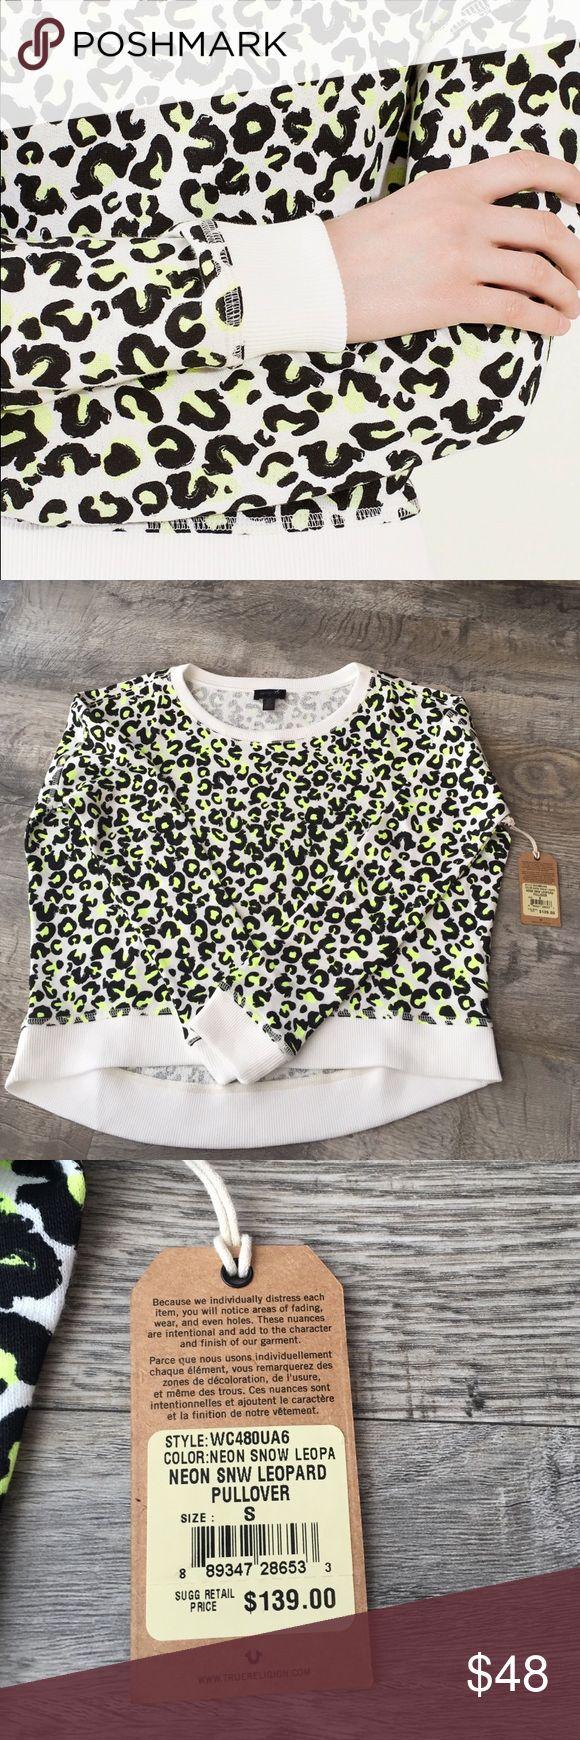 True religion leopard pullover sweatshirt new top True religion leopard pullover sweatshirt new with tags retail 139 neon leopard pattern so cute true religion Tops